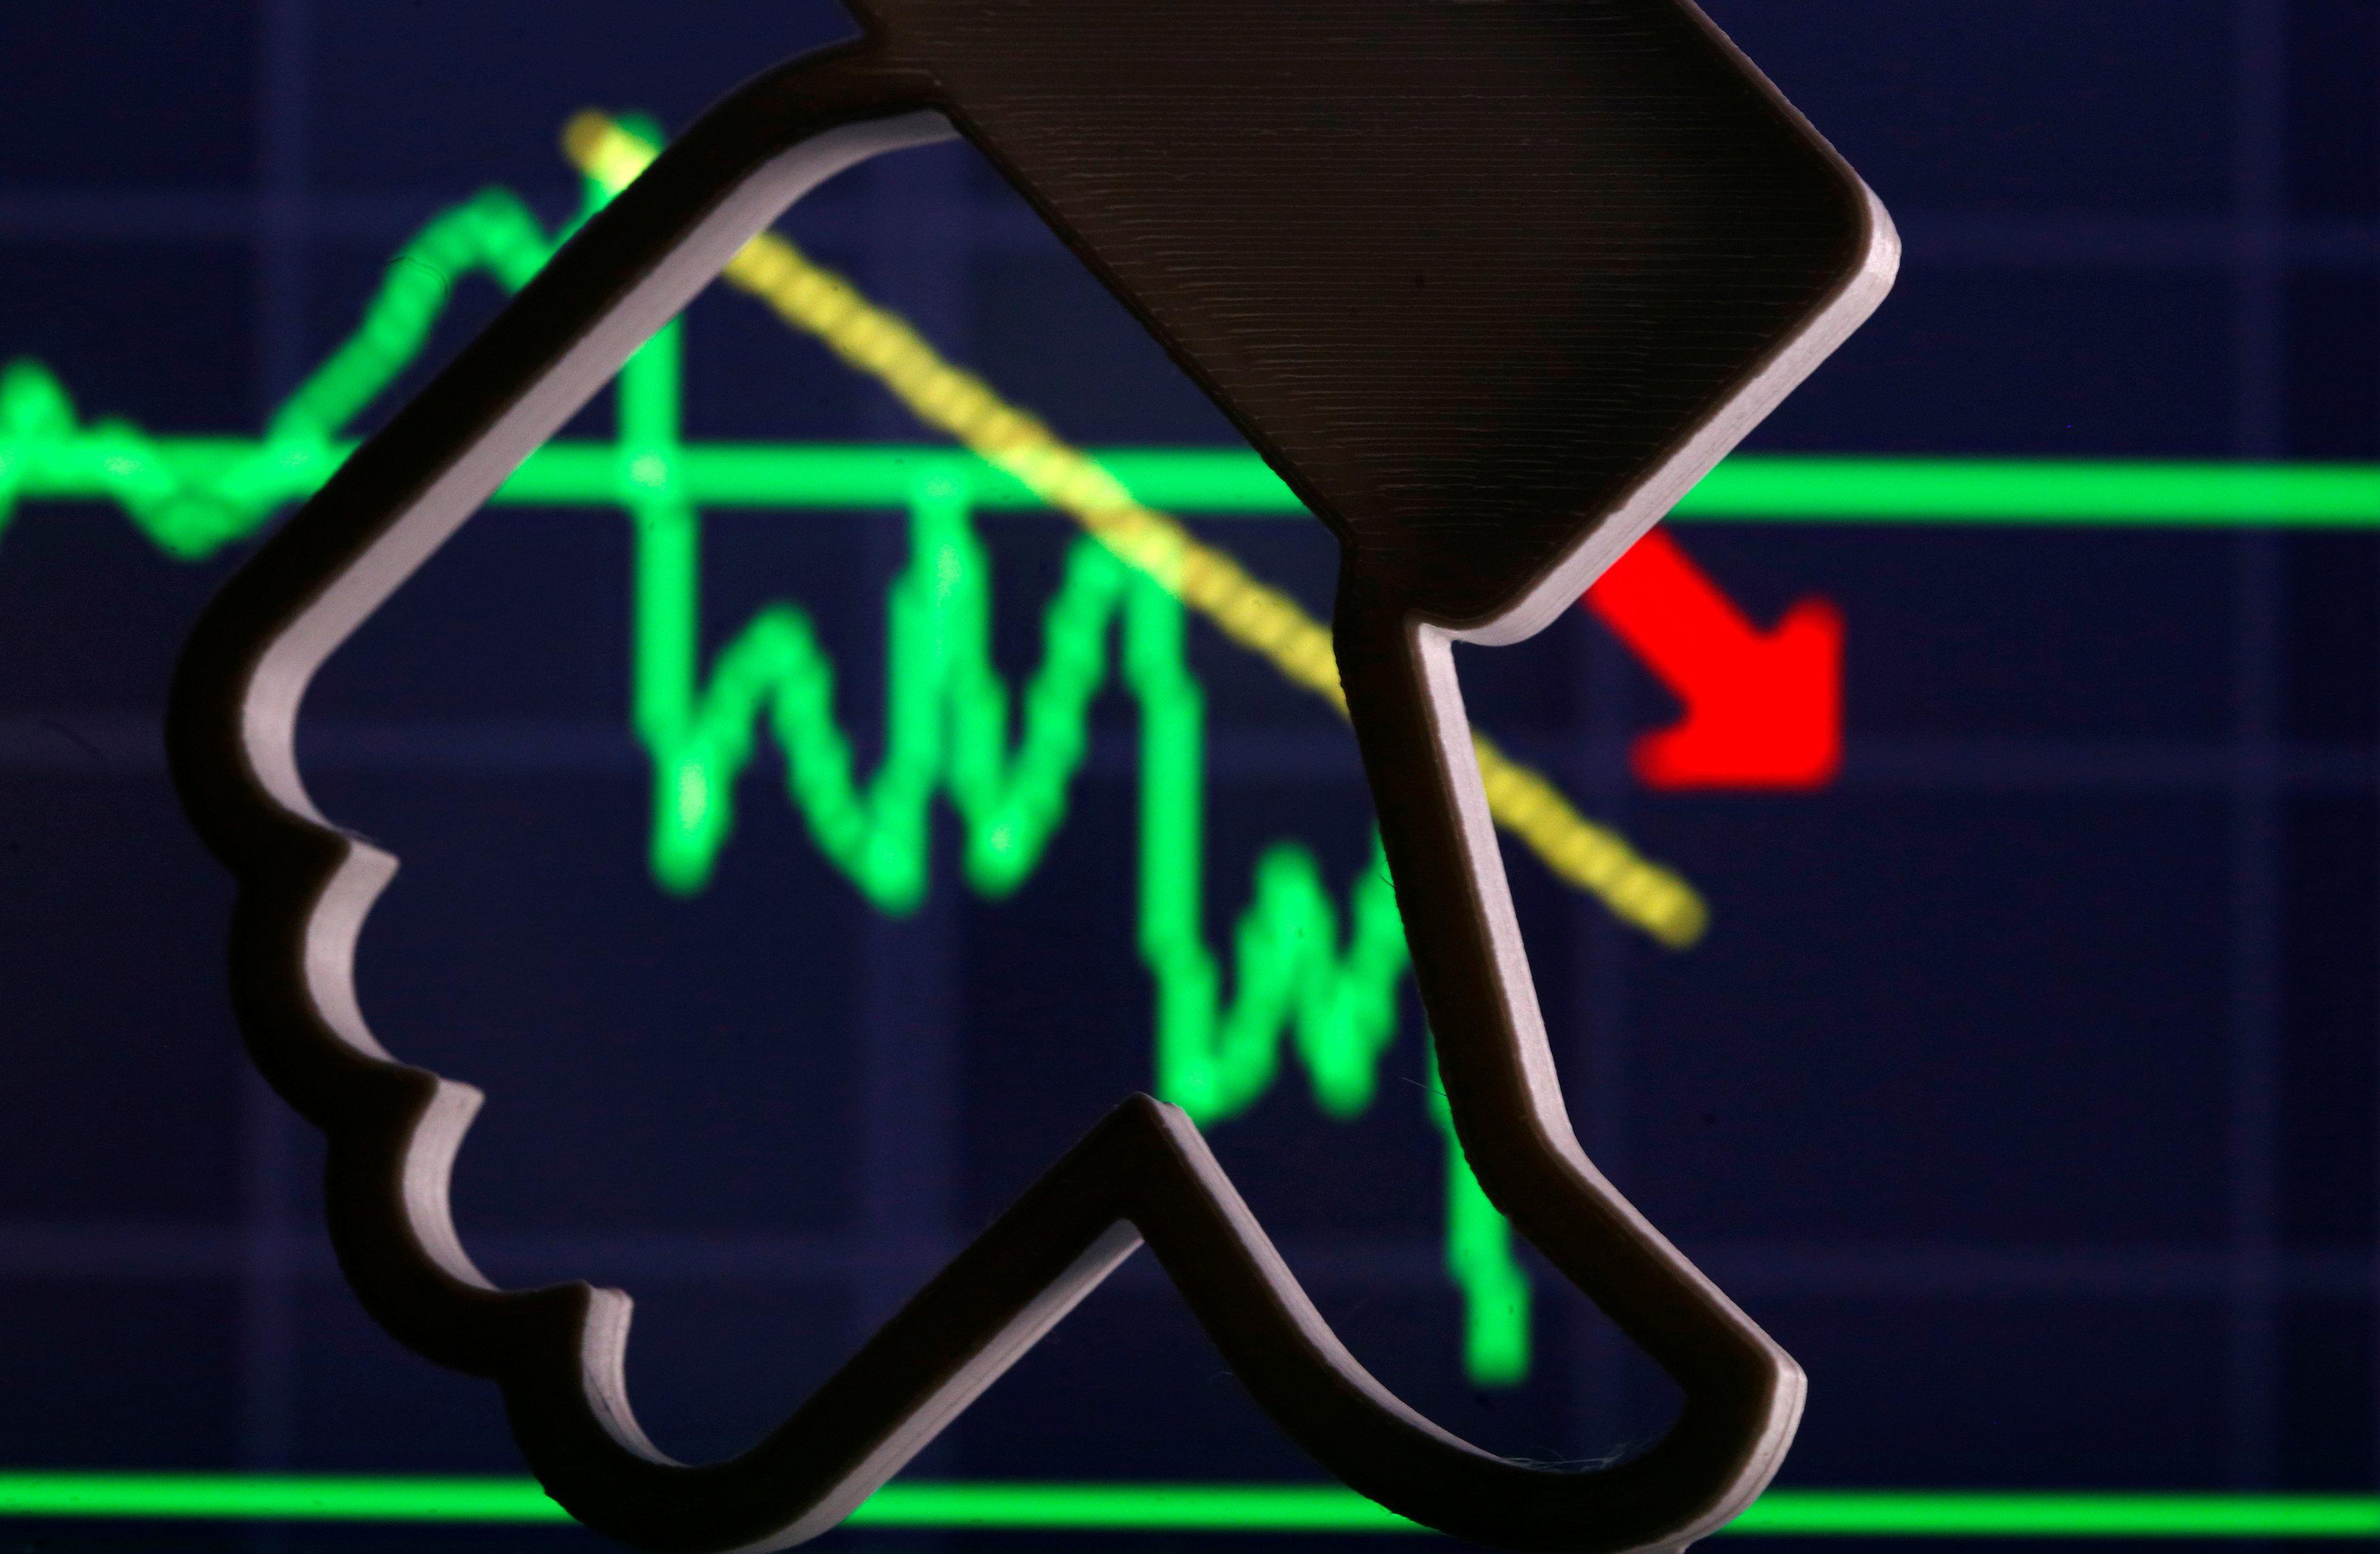 Le réseau socialcontinue sa chute à Wall